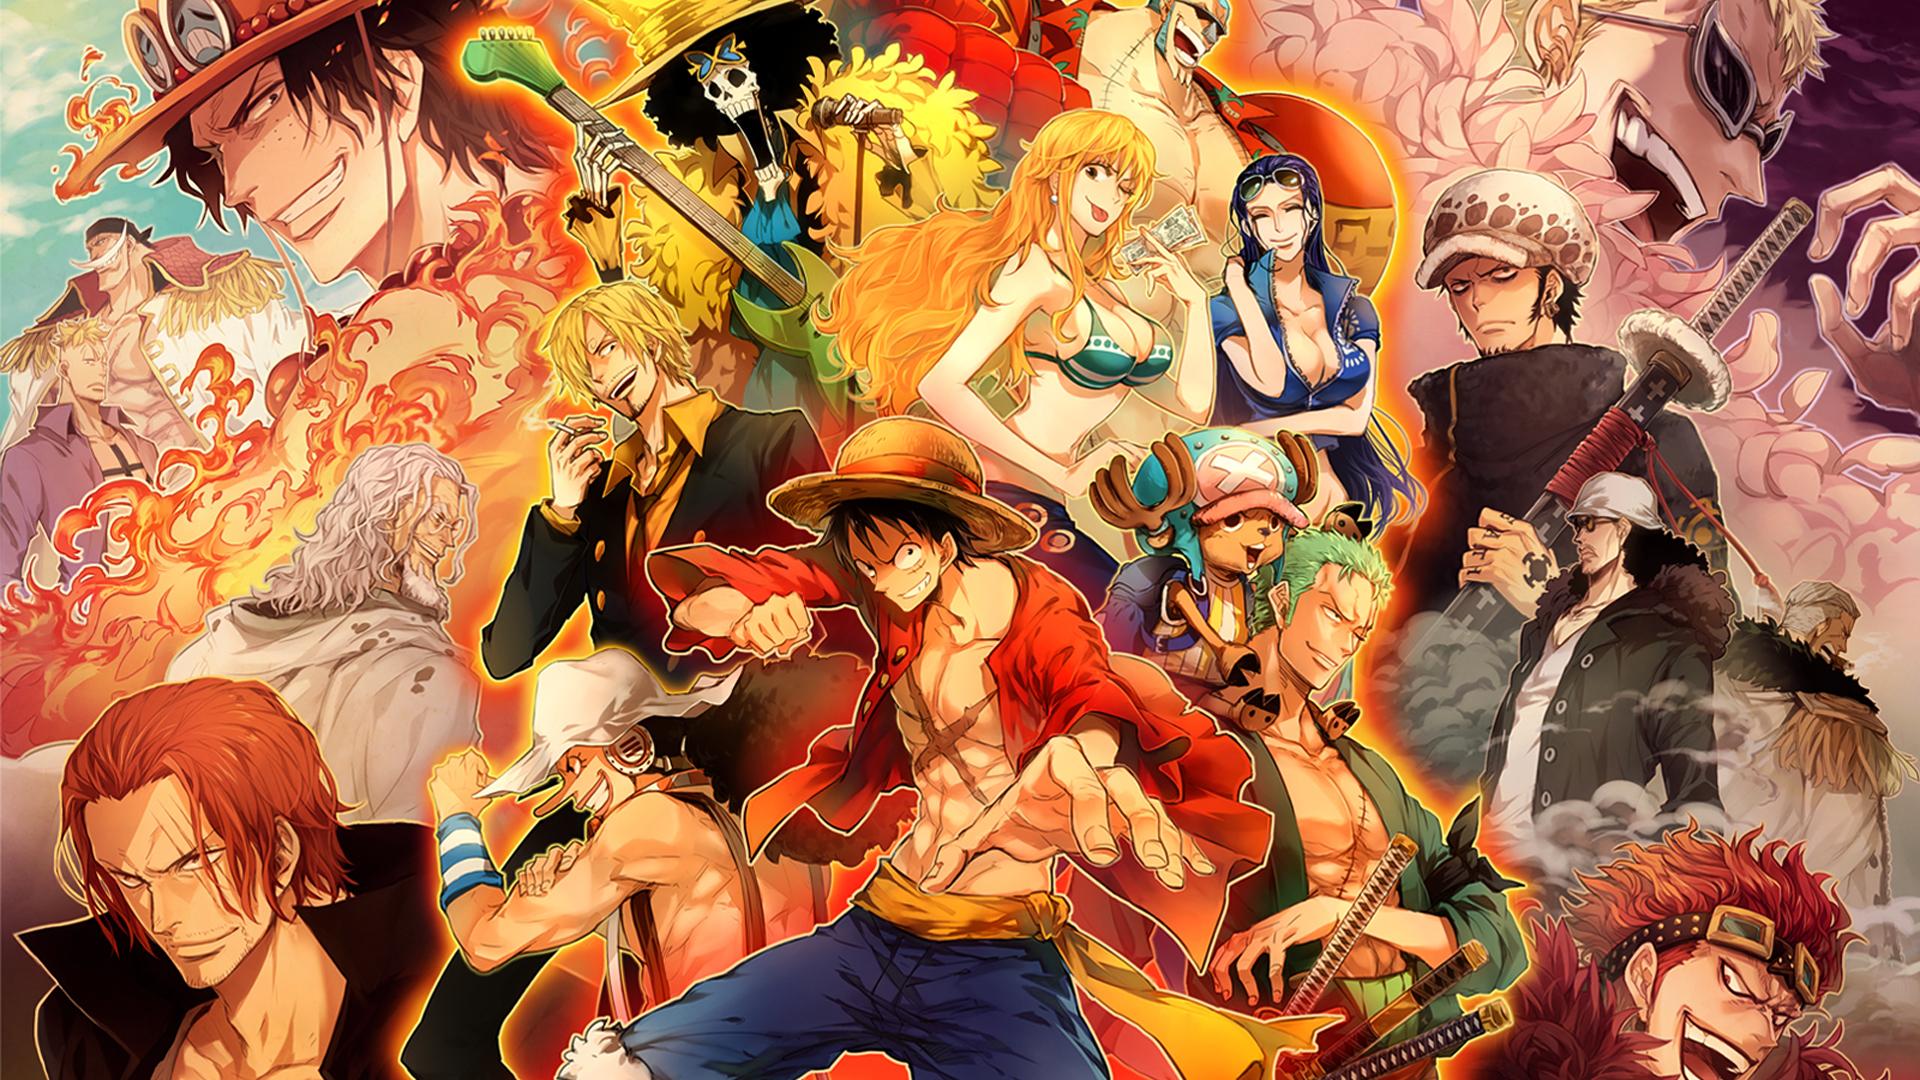 Anime One Piece Wallpaper Hd 1920x1080